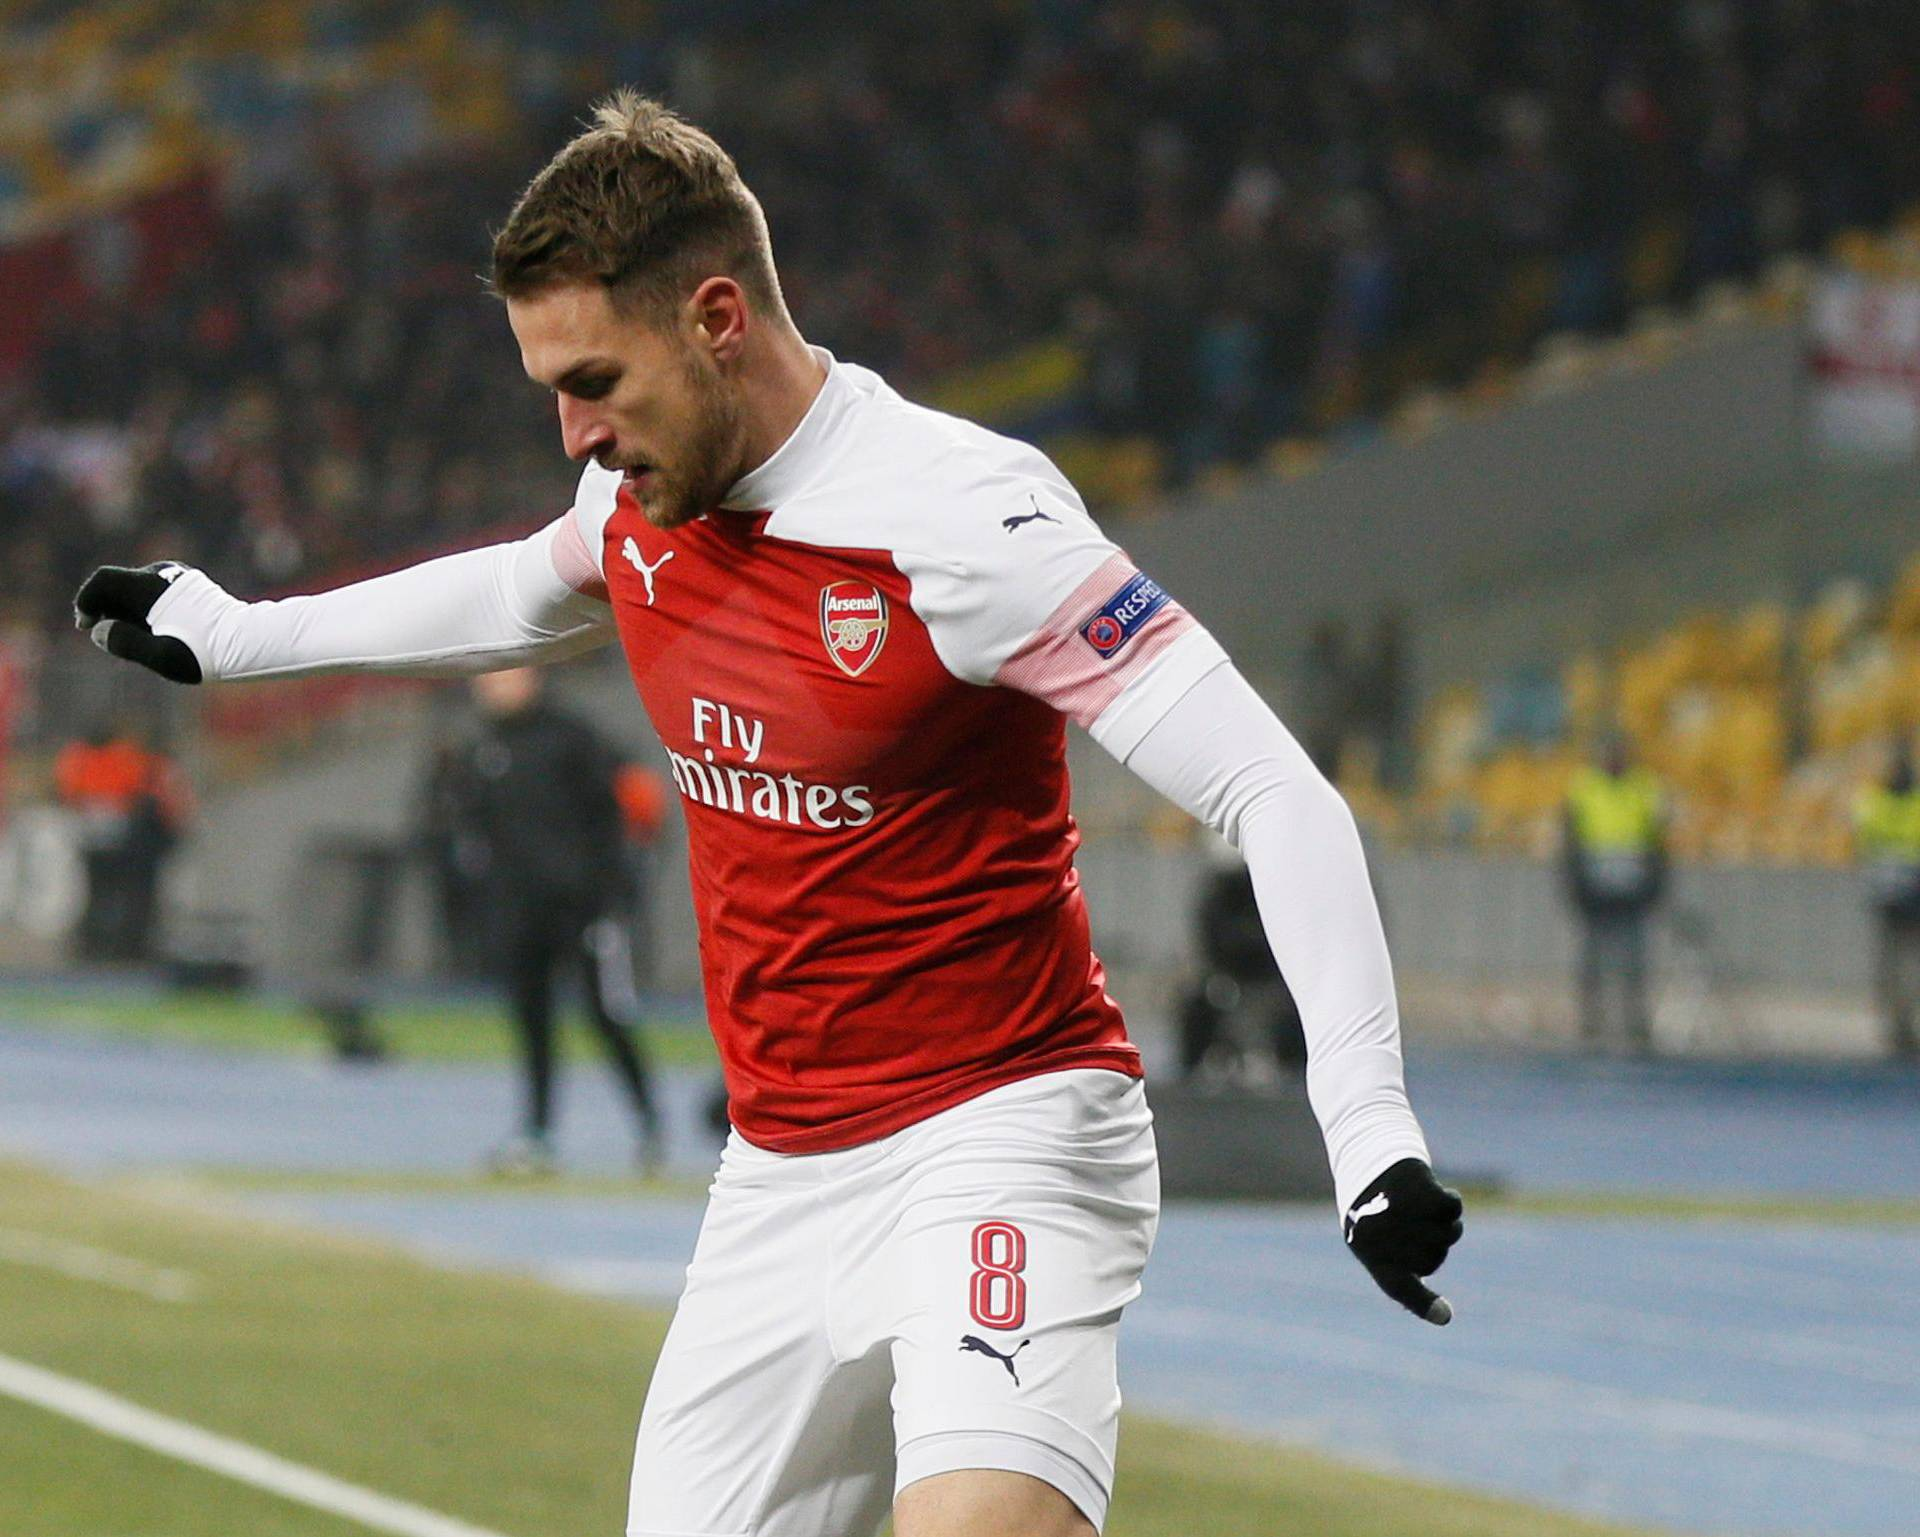 Europa League - Group Stage - Group E - FC Vorskla Poltava v Arsenal